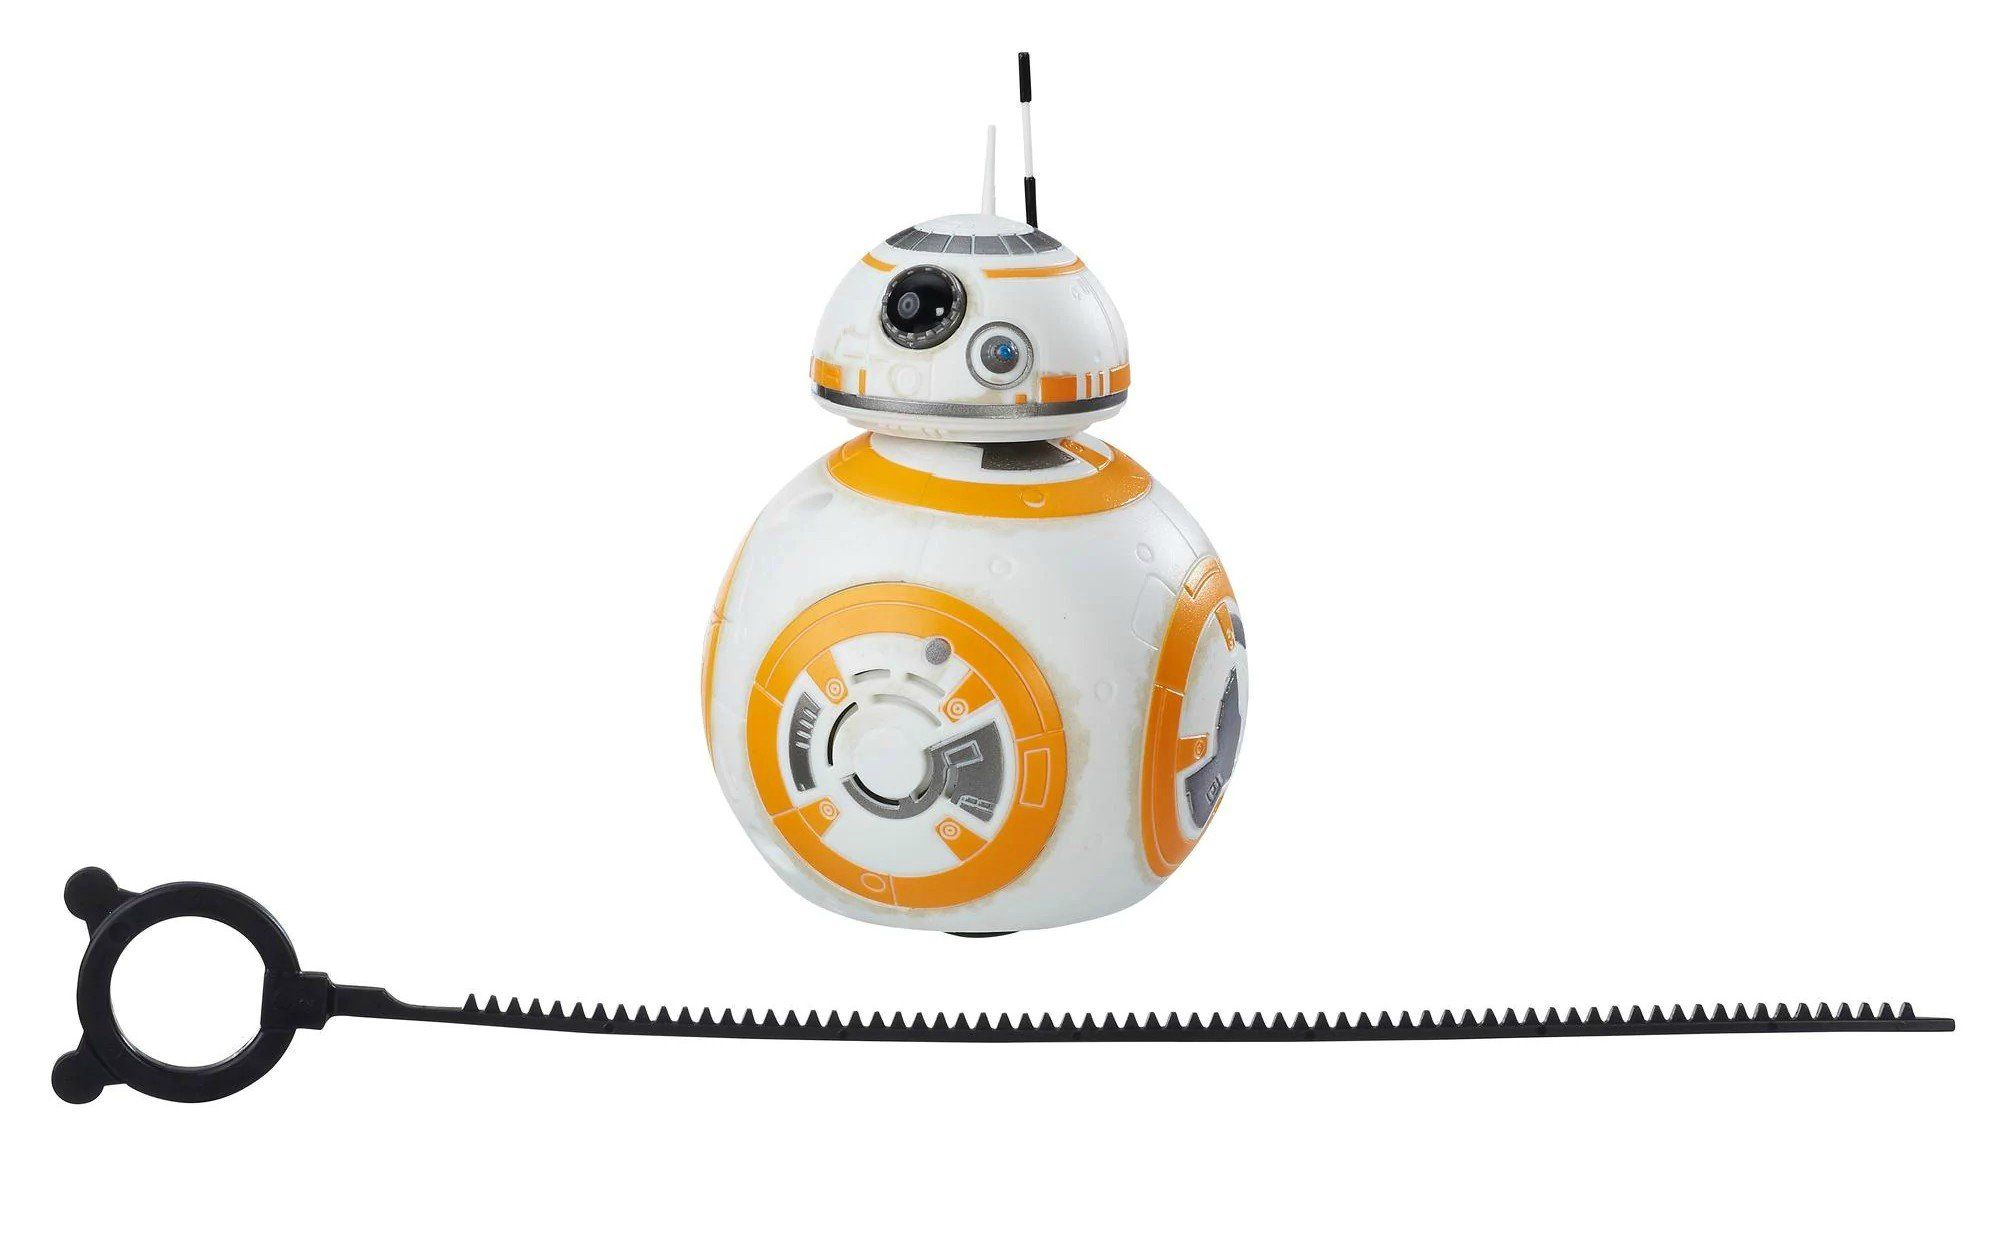 Star Wars Droide BB-8 Impulsionado - Hasbro